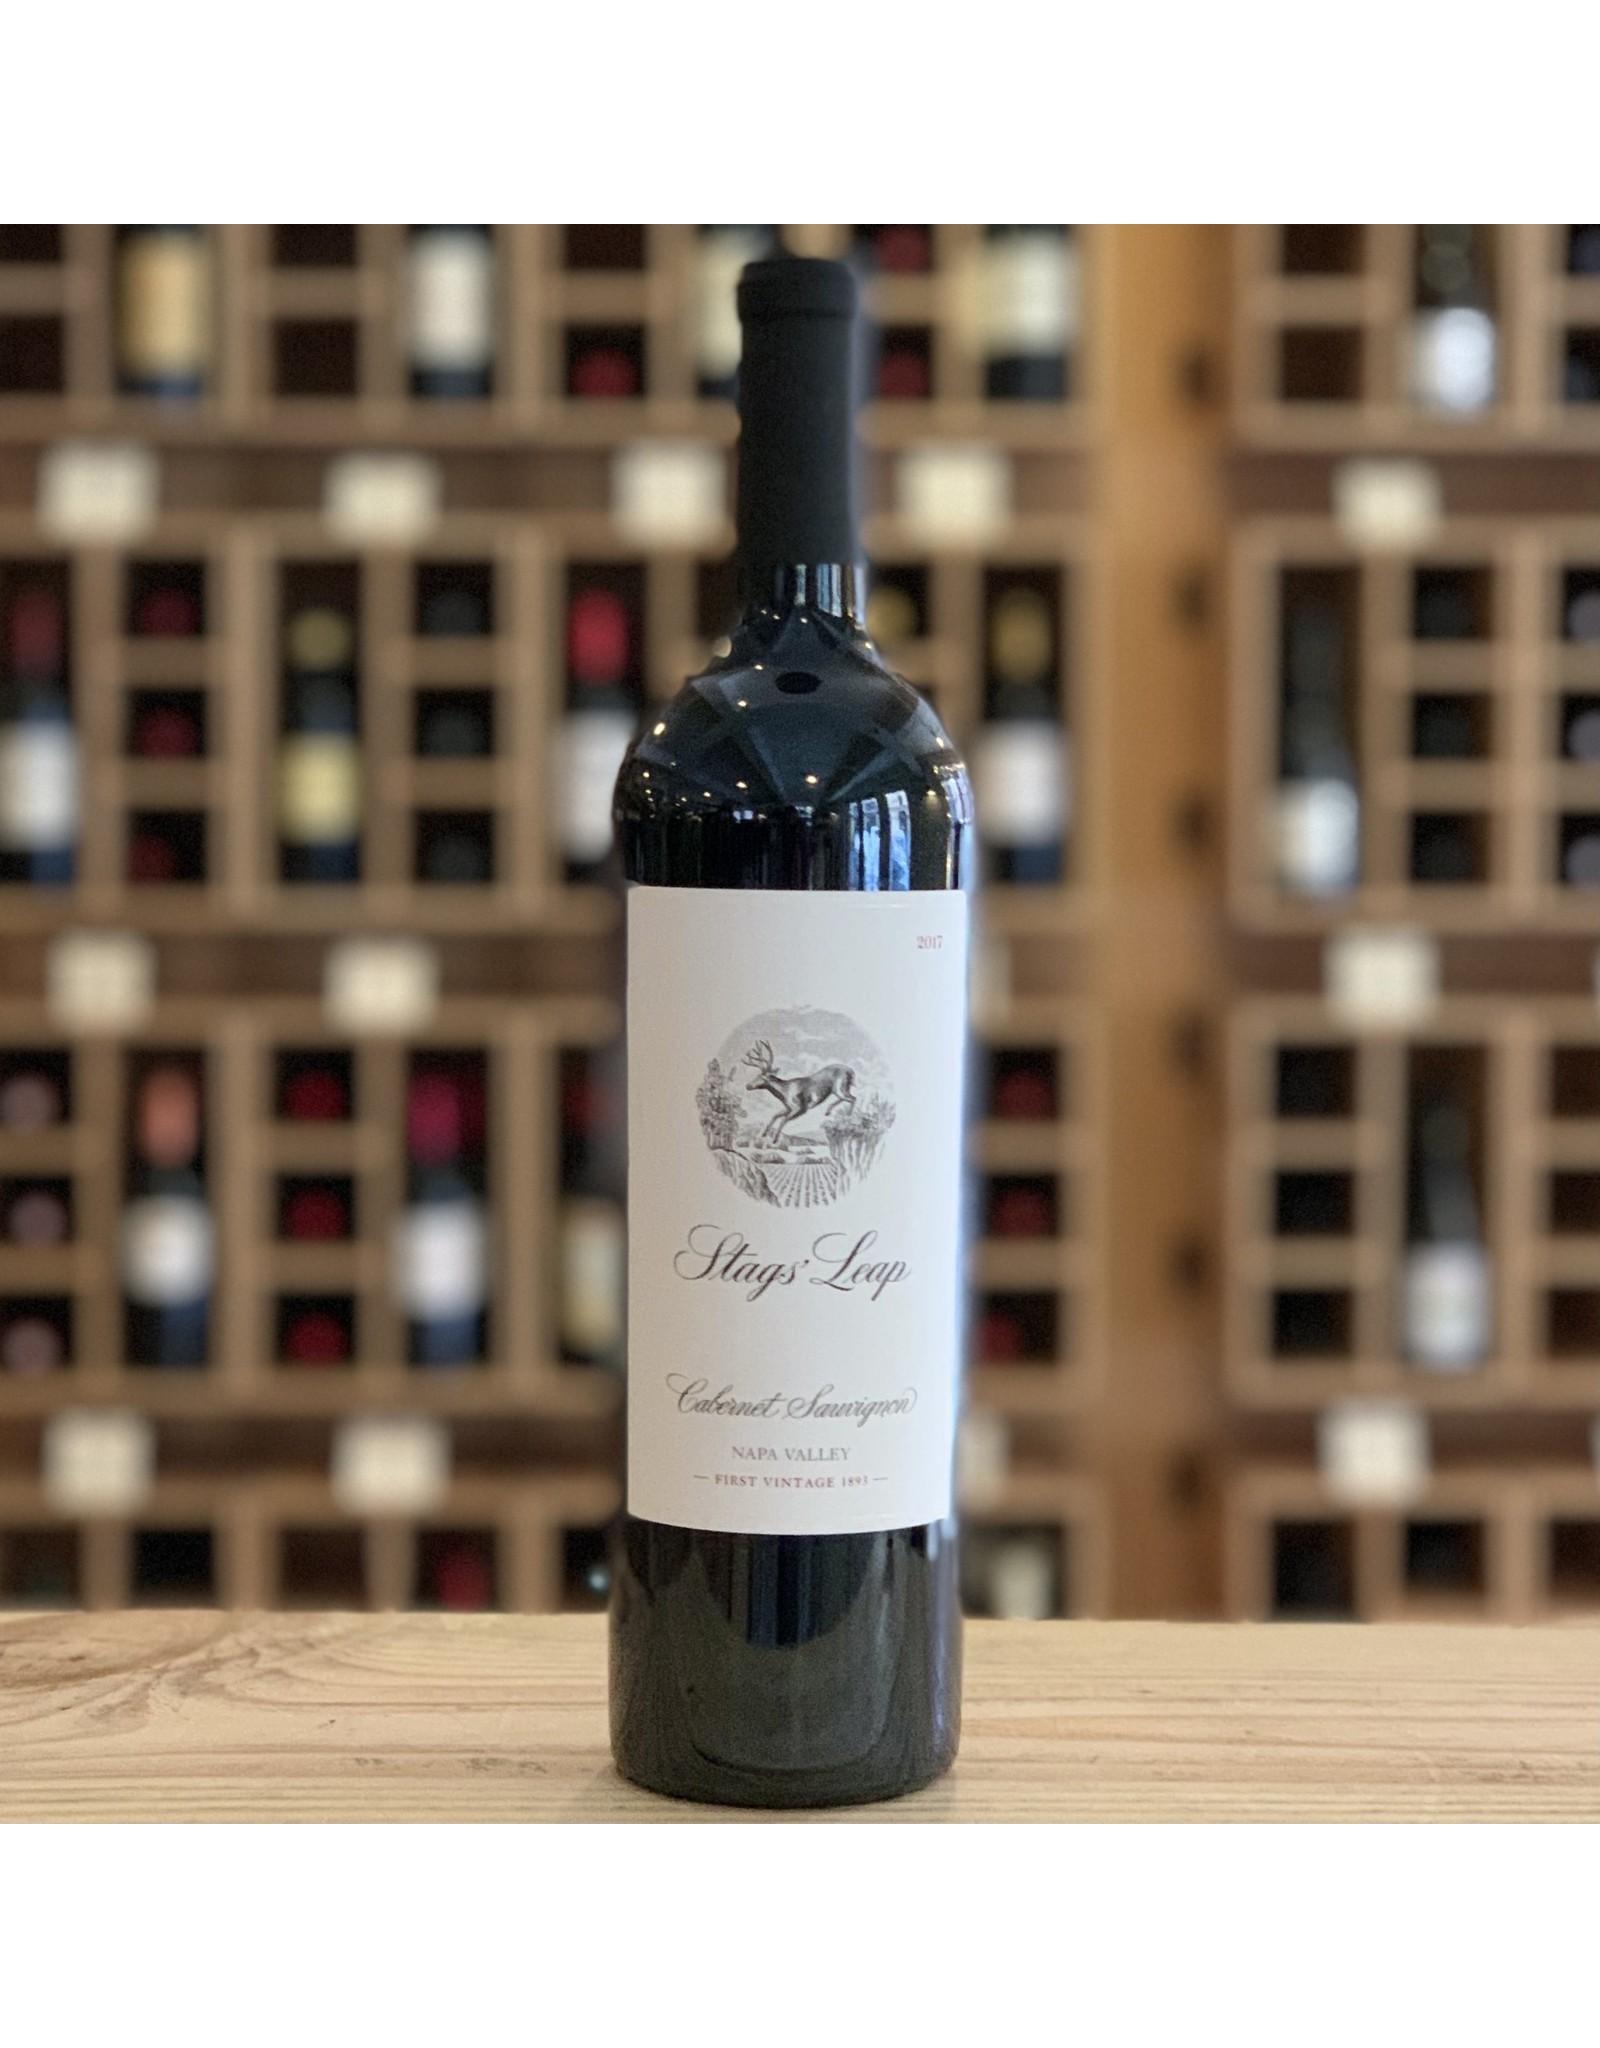 Napa Valley Stags' Leap Winery Cabernet Sauvignon 2018 - Napa Valley, California